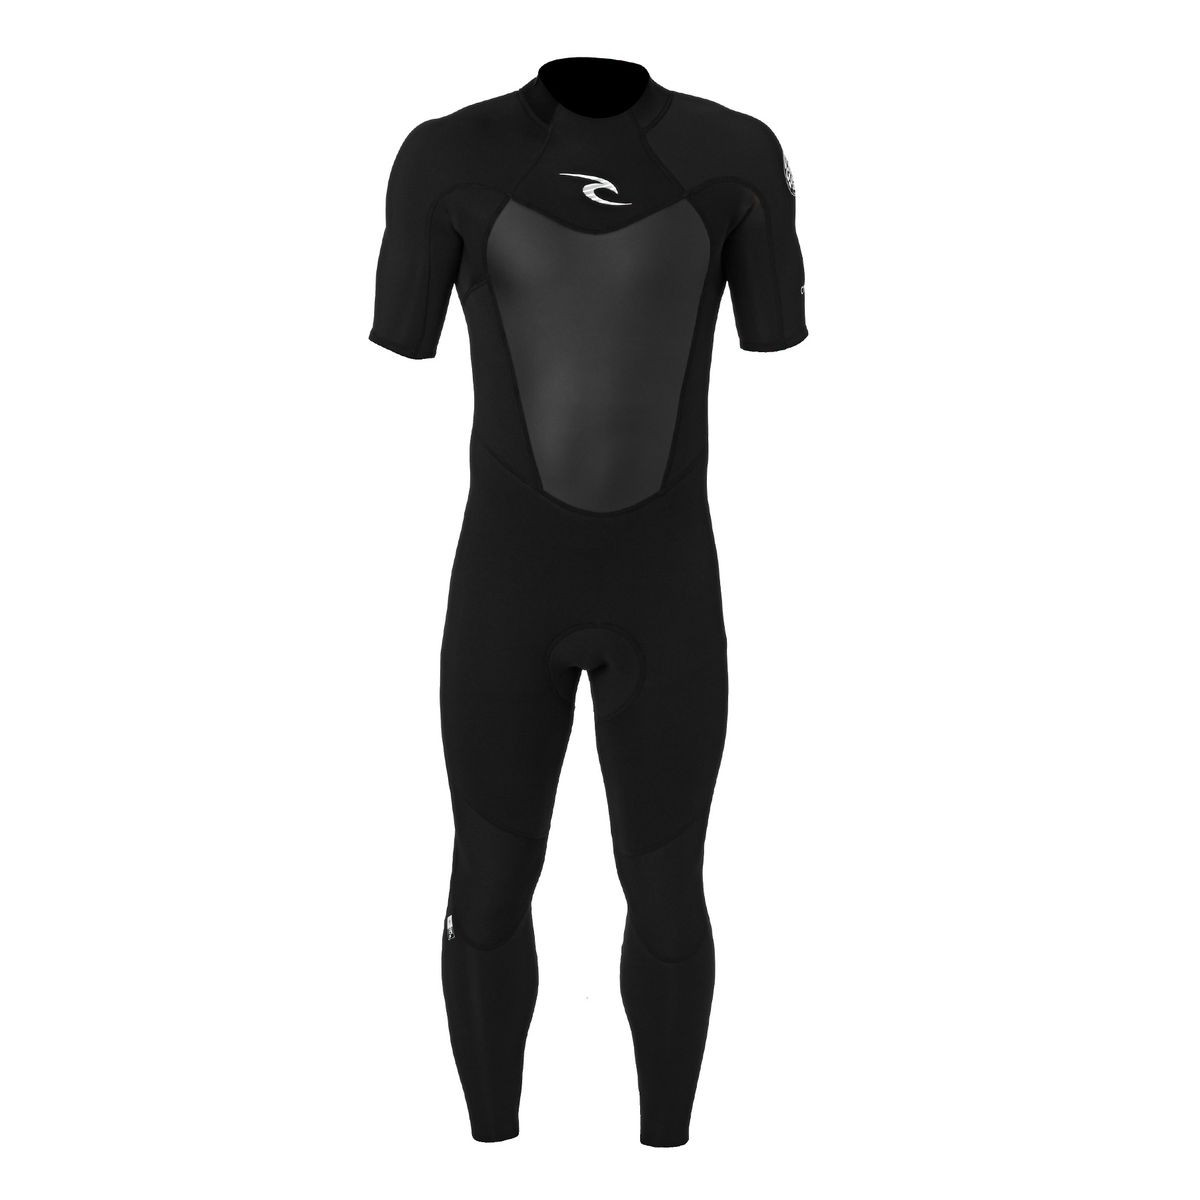 Rip Curl Omega 2/2mm Short Sleeve Back Zip Wetsuit - Black